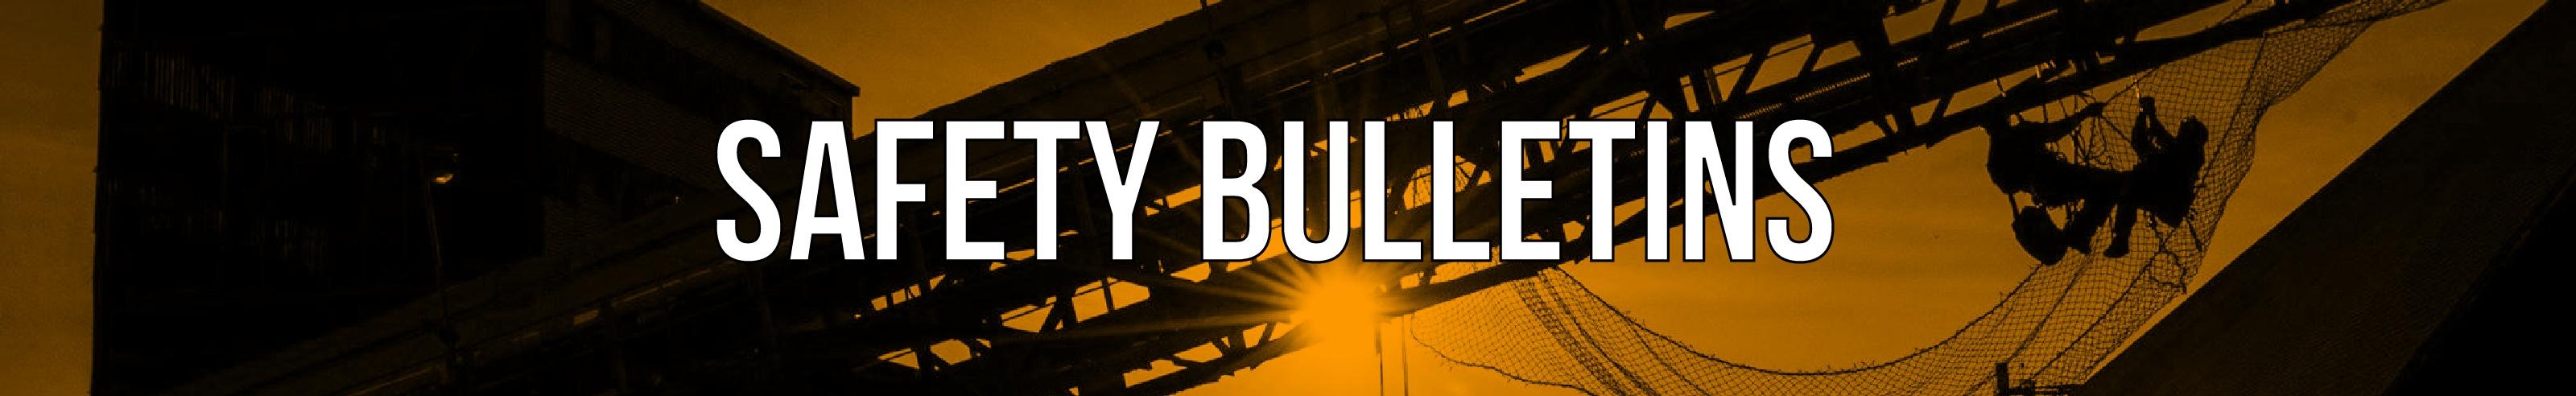 Safety Bulletins-01